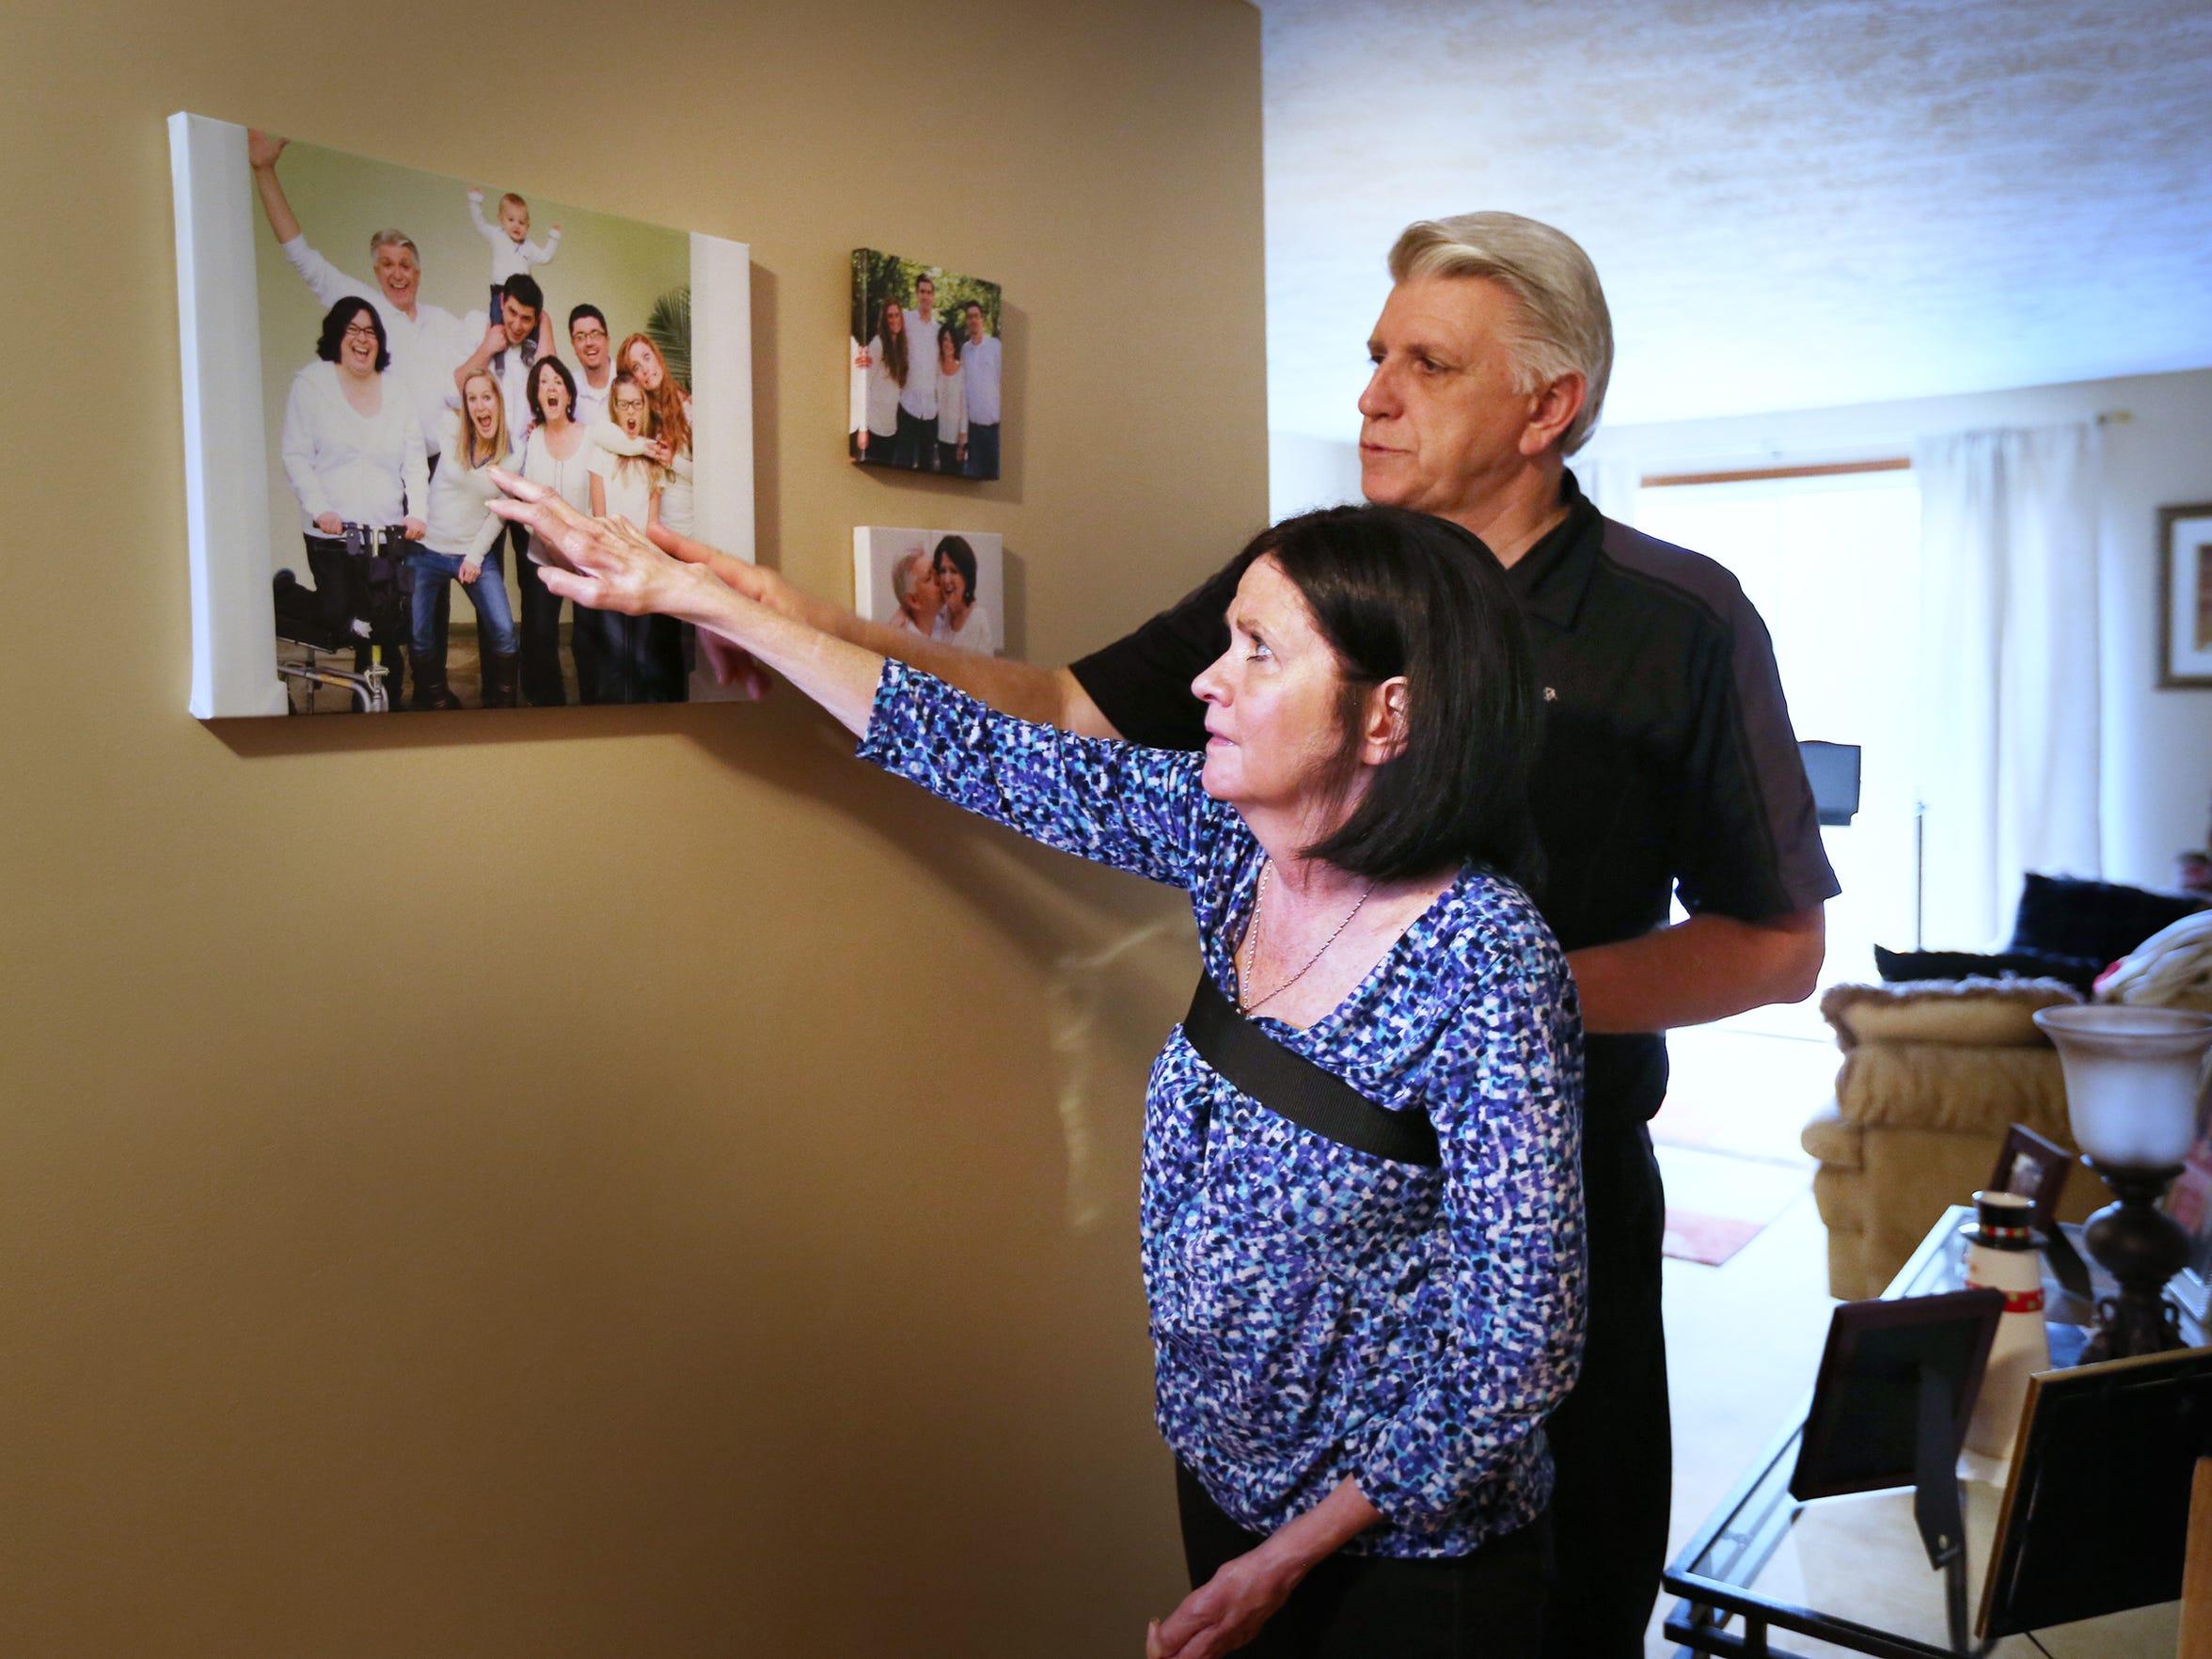 Maureen and Jim Burakiewicz look at a fun family photo